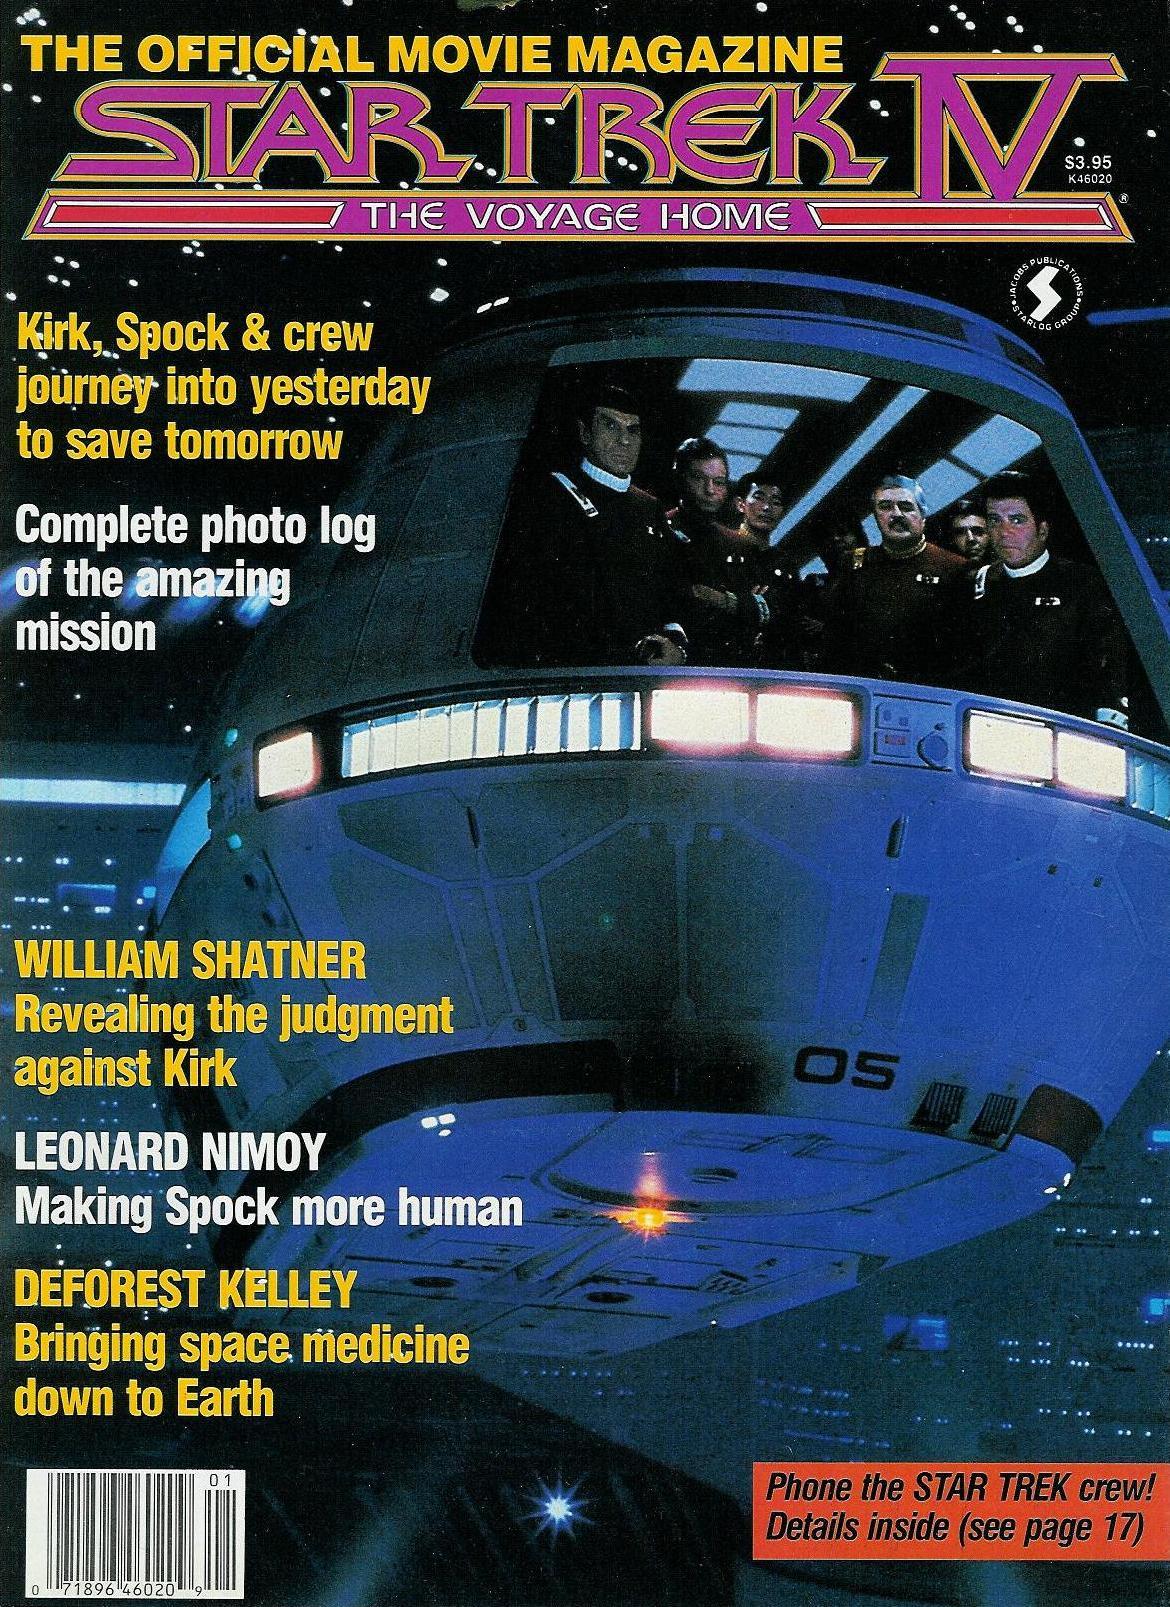 Star Trek IV Official Movie Magazine cover